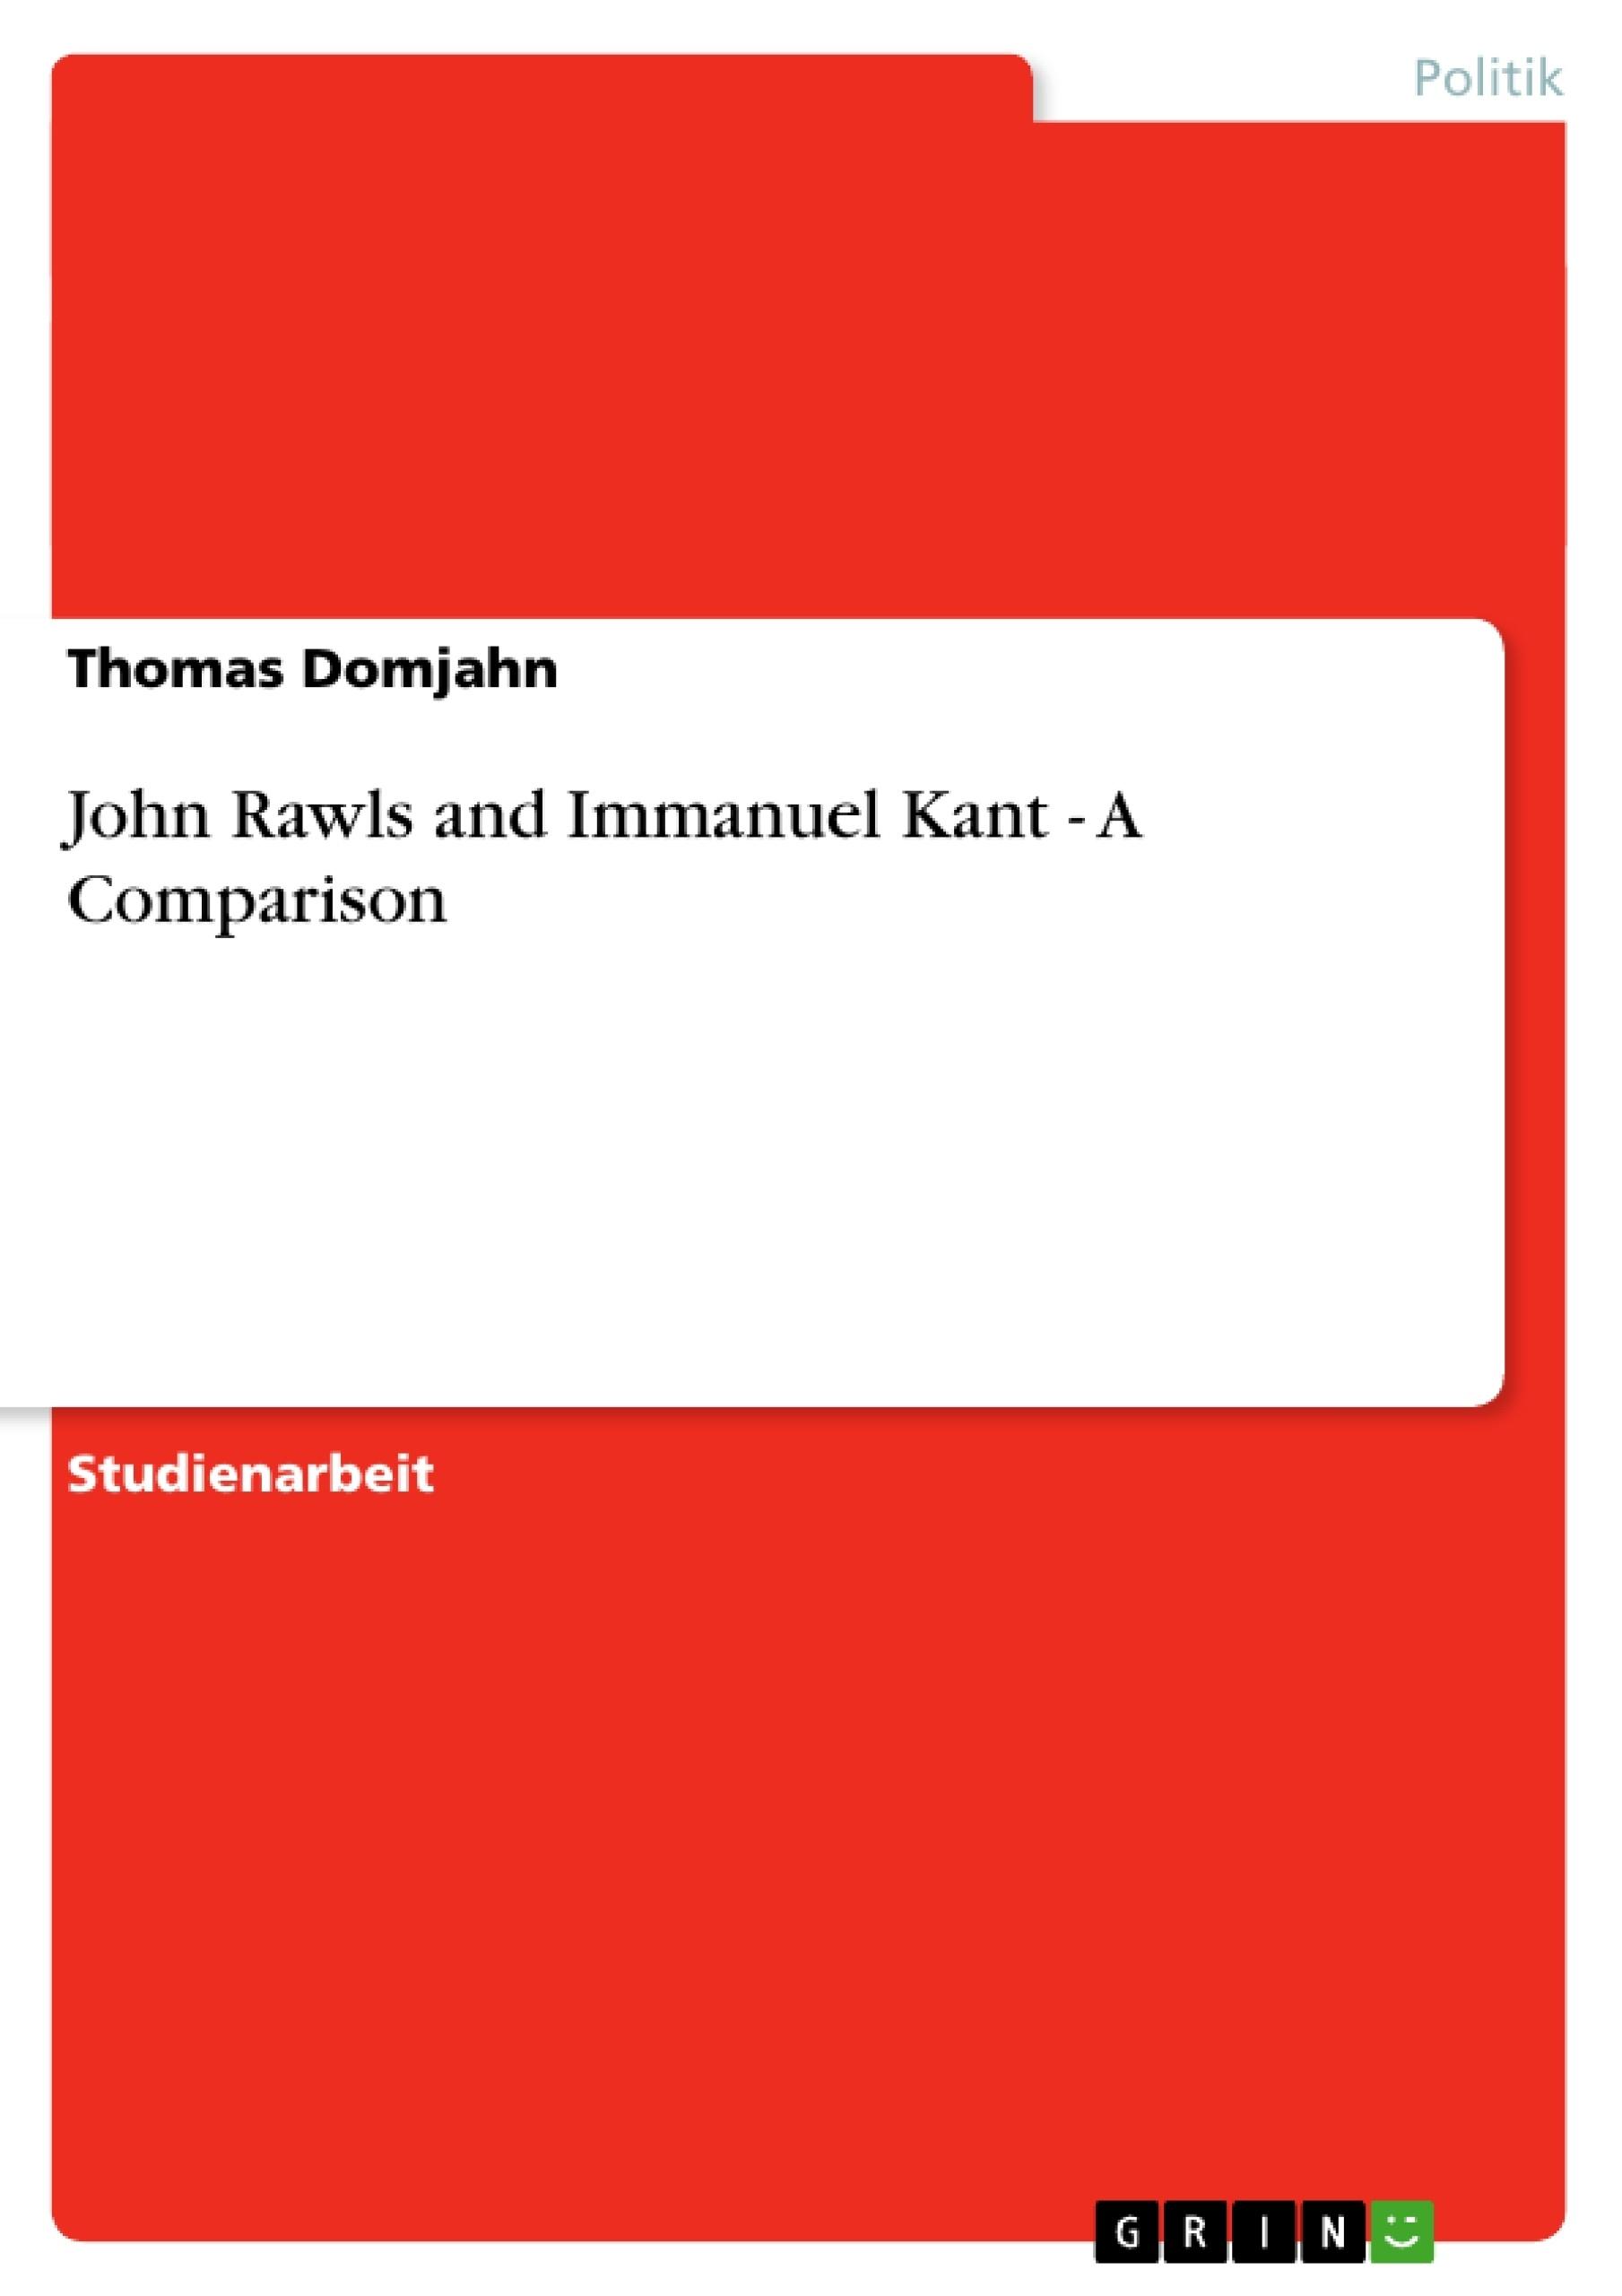 Titel: John Rawls and Immanuel Kant - A Comparison